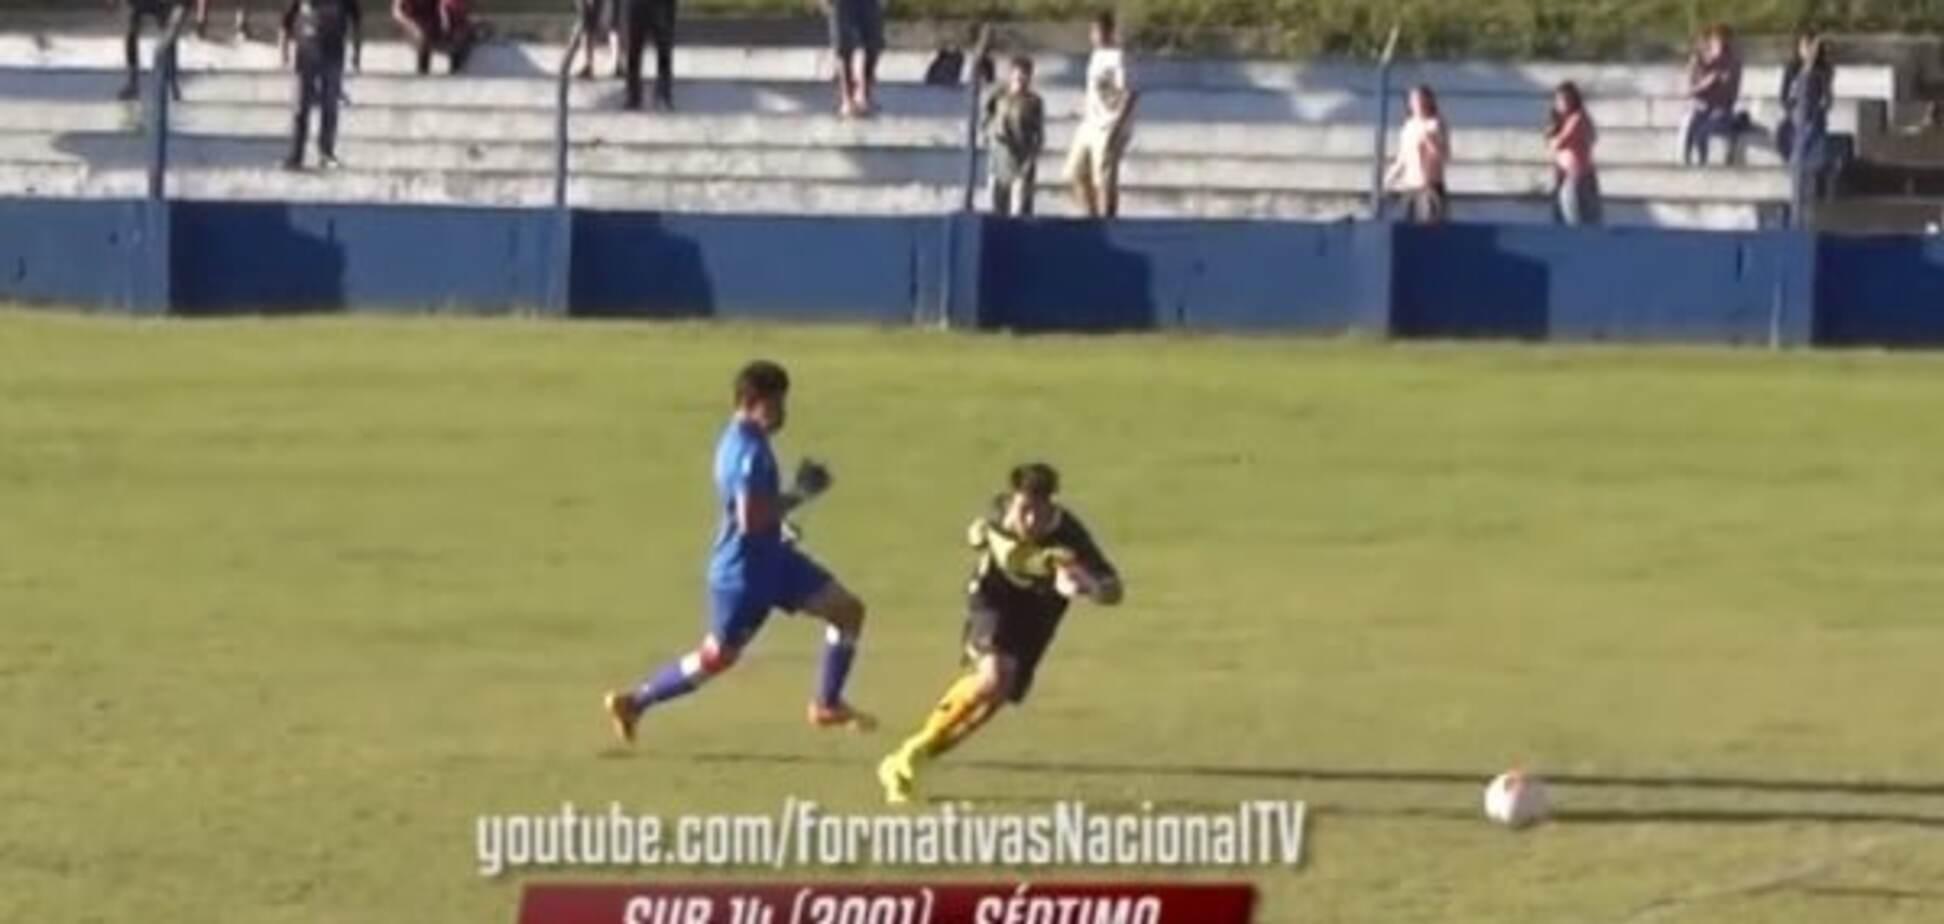 Фантастика! Уругвайский вратарь забил гол, пробежав с мячем все поле: видео шедевра